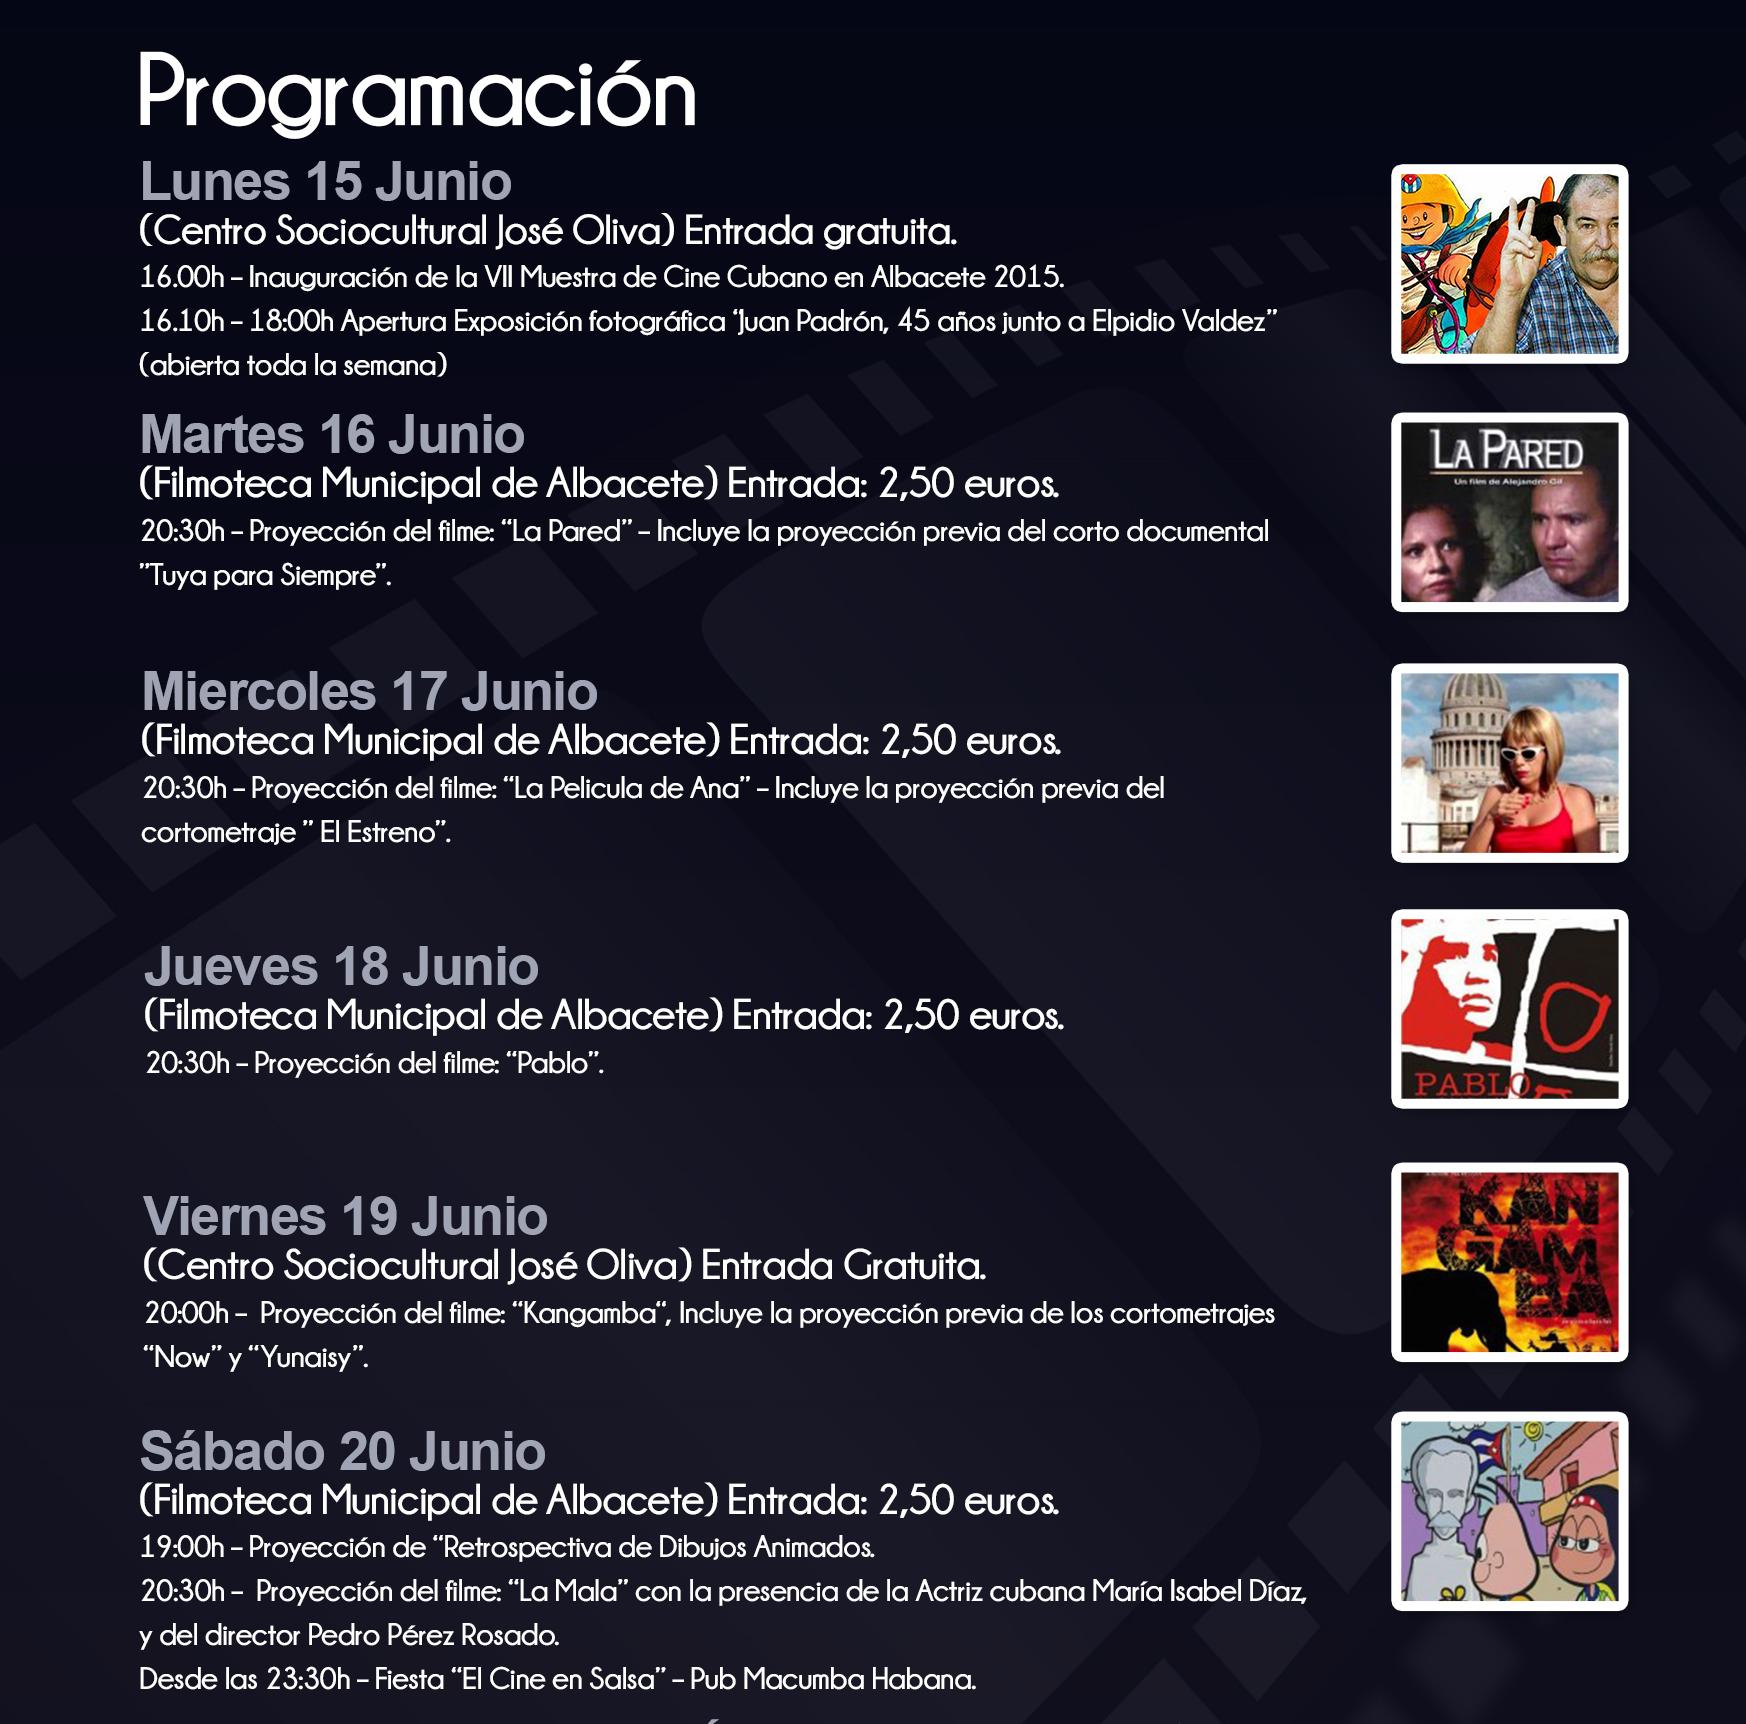 PROGRAMA CINE CUBANO